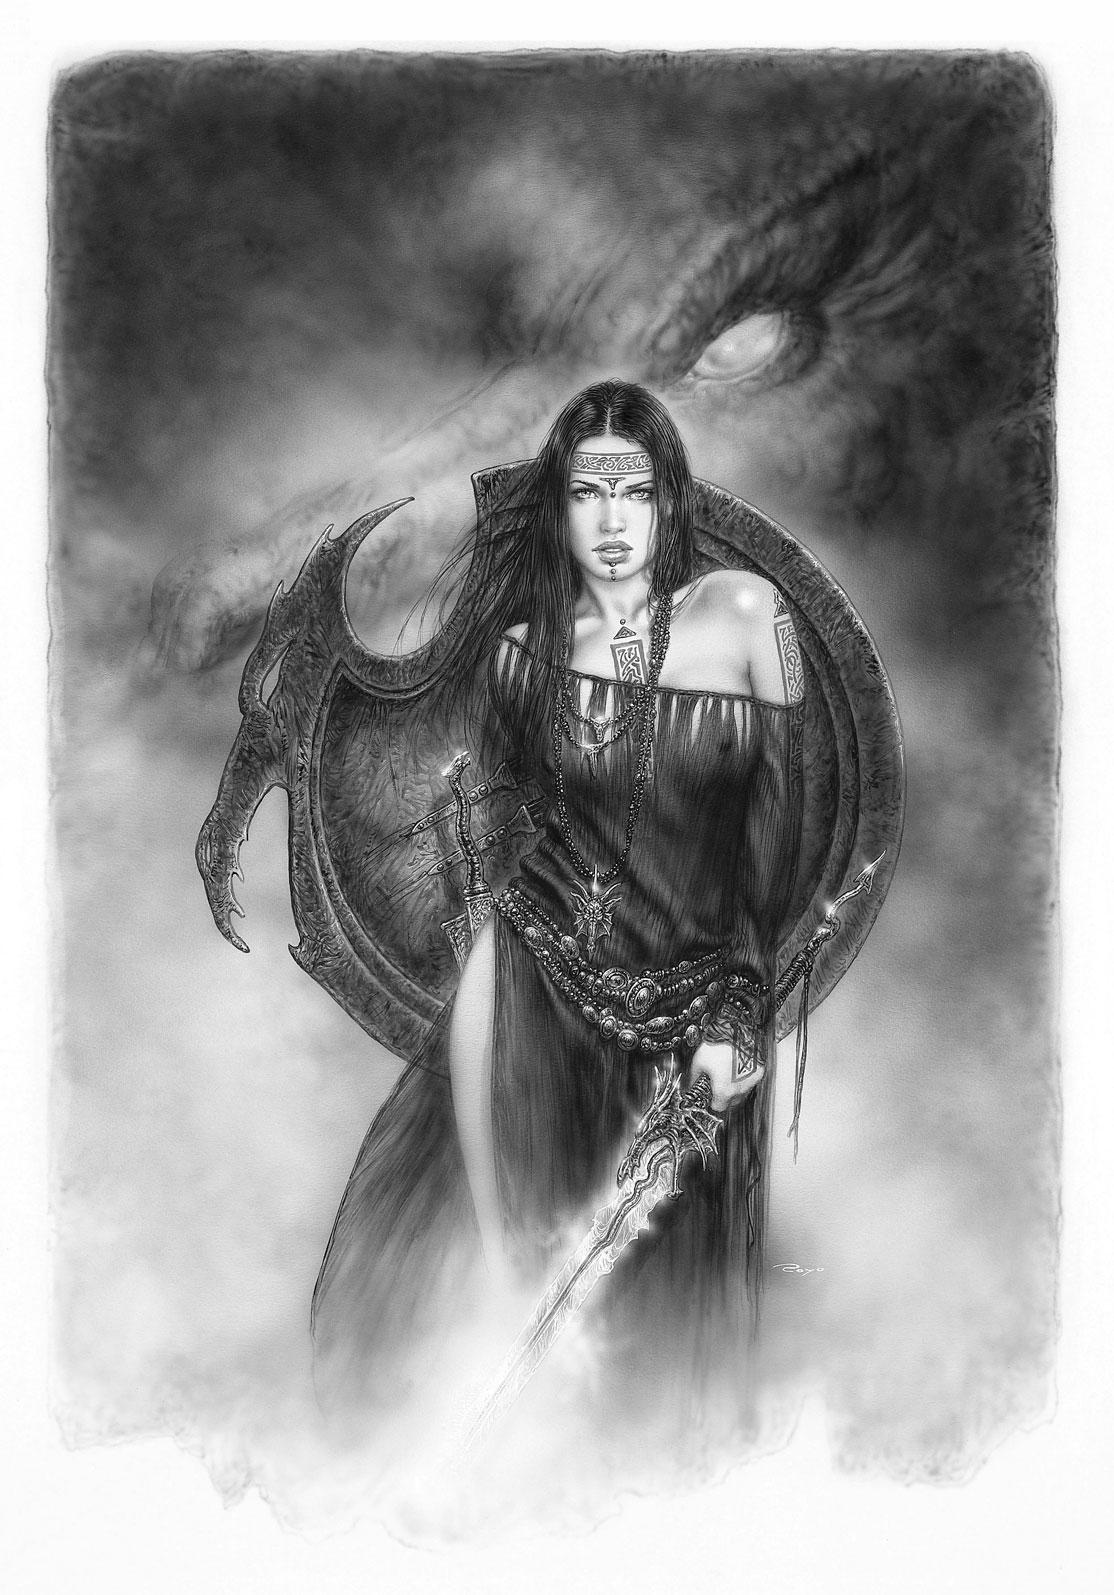 Ref 18426 - The Guardian of the Black Dragon - 30 x 47 cm - Subversive Beauty - pag 43 - Espada y Fantasia